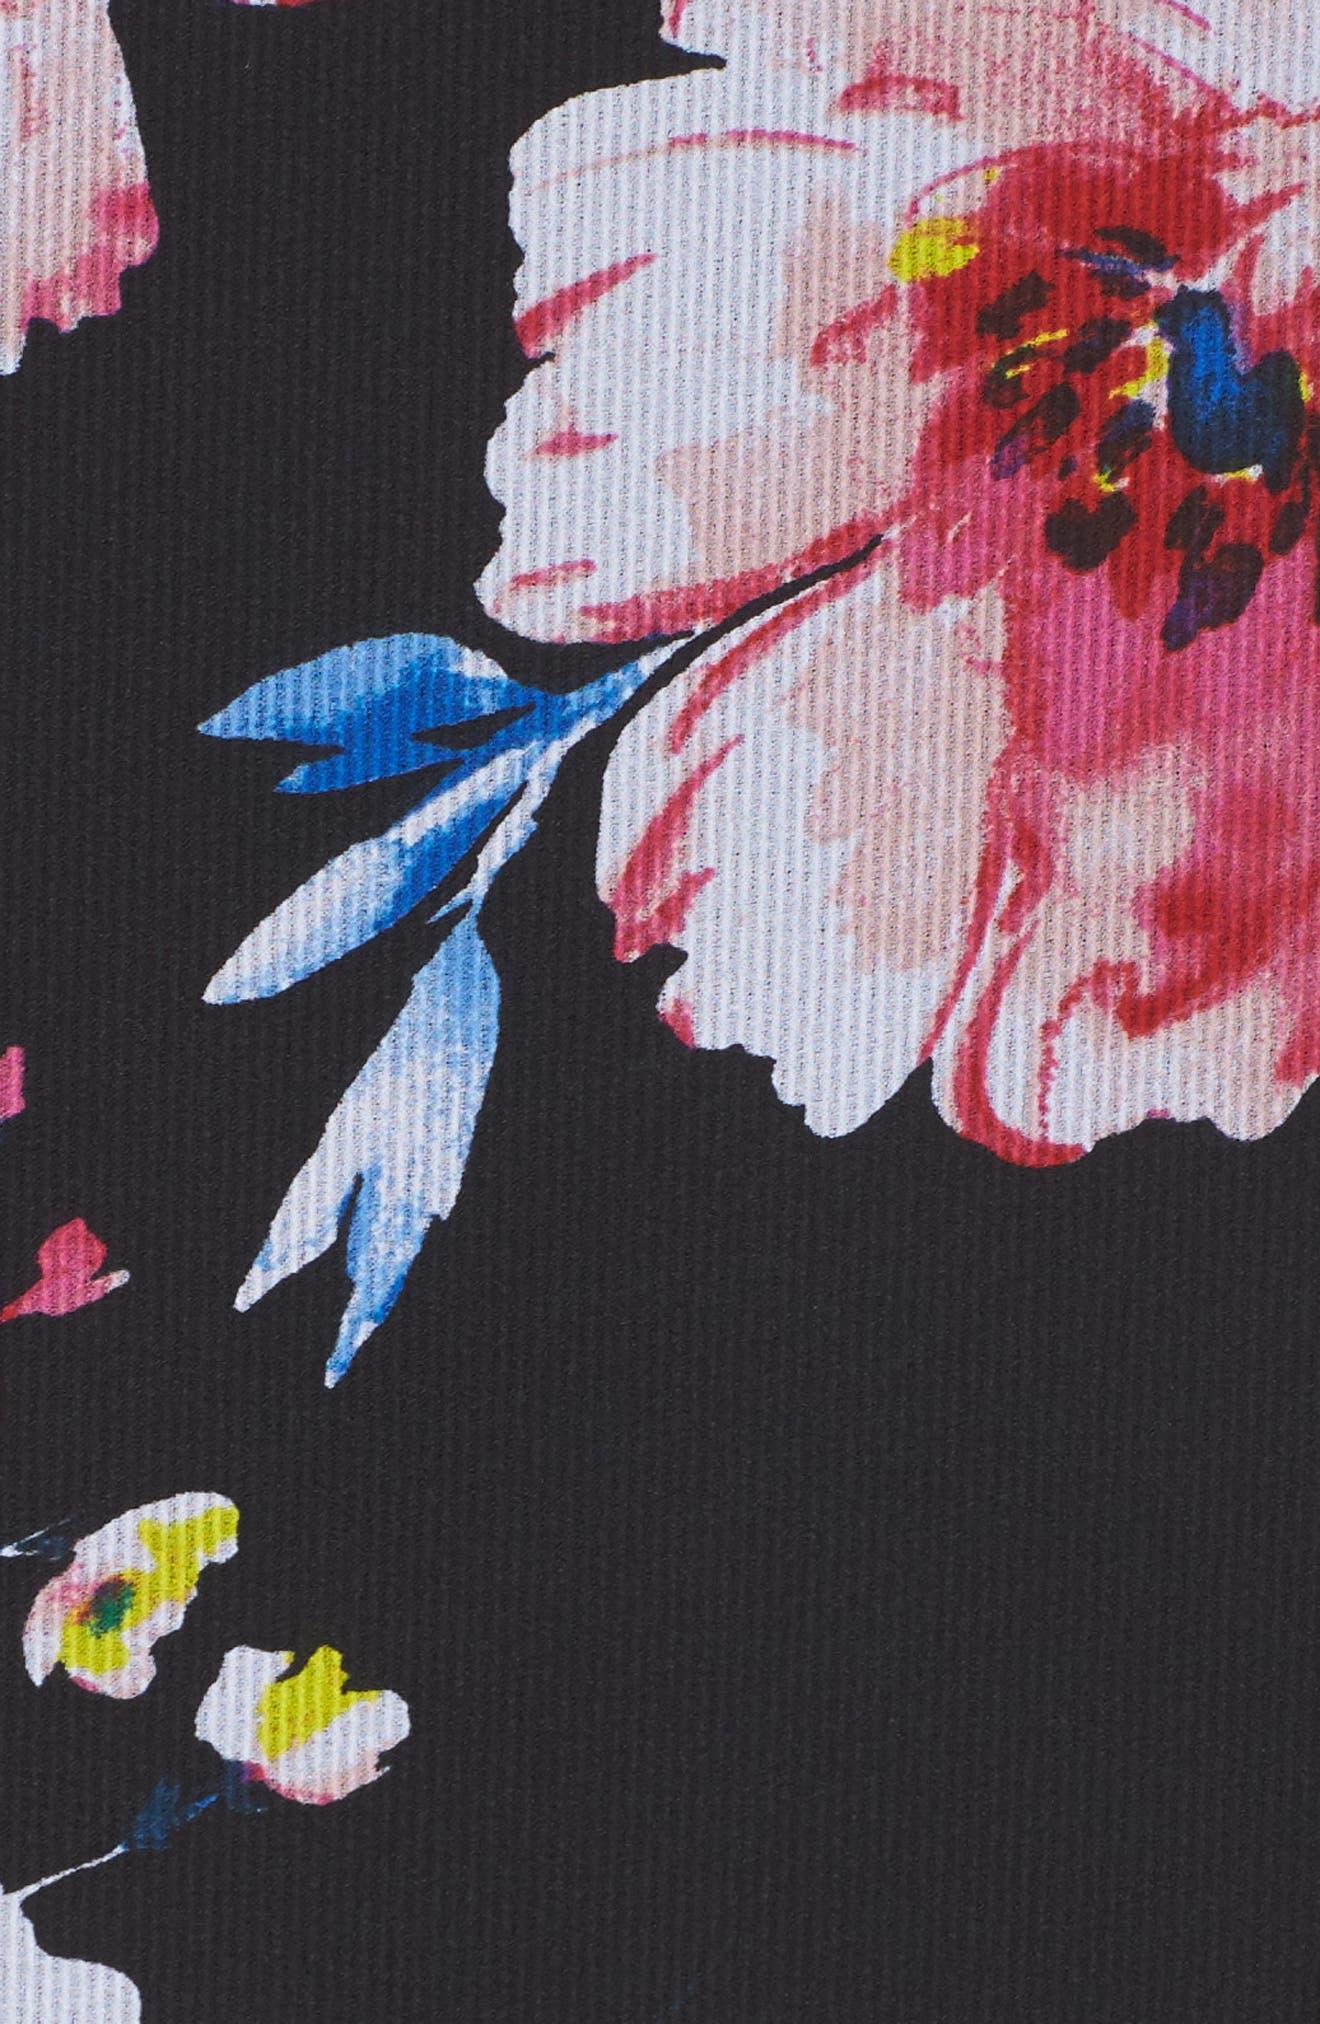 Tie Neck Ruffle Hem Dress,                             Alternate thumbnail 6, color,                             Black/ Fuchsia/ Blue